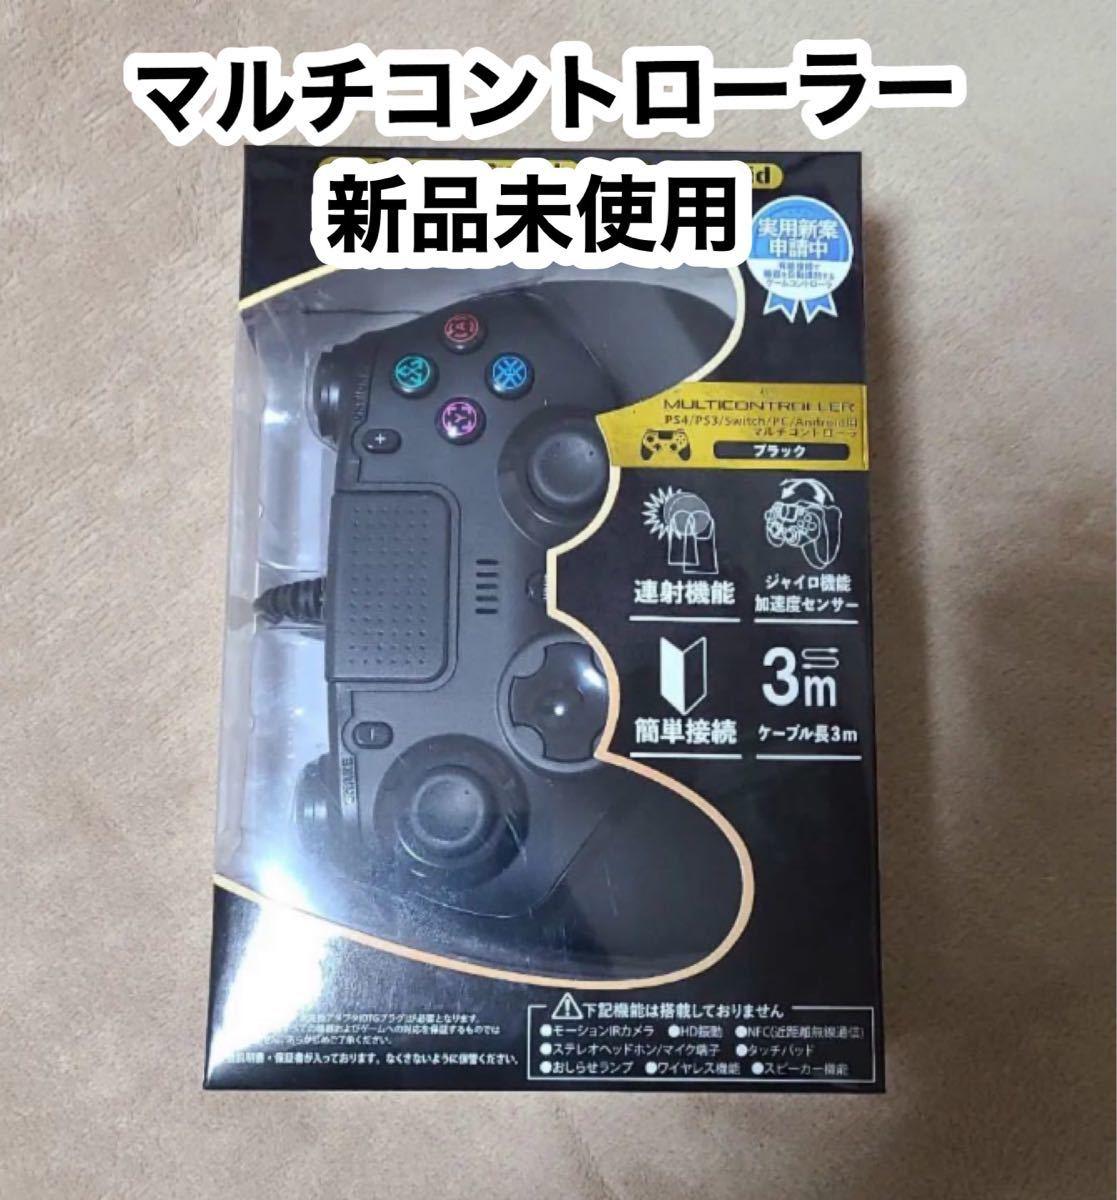 PS4/PS3/PC/Android用 マルチコントローラ ANS-H110BK